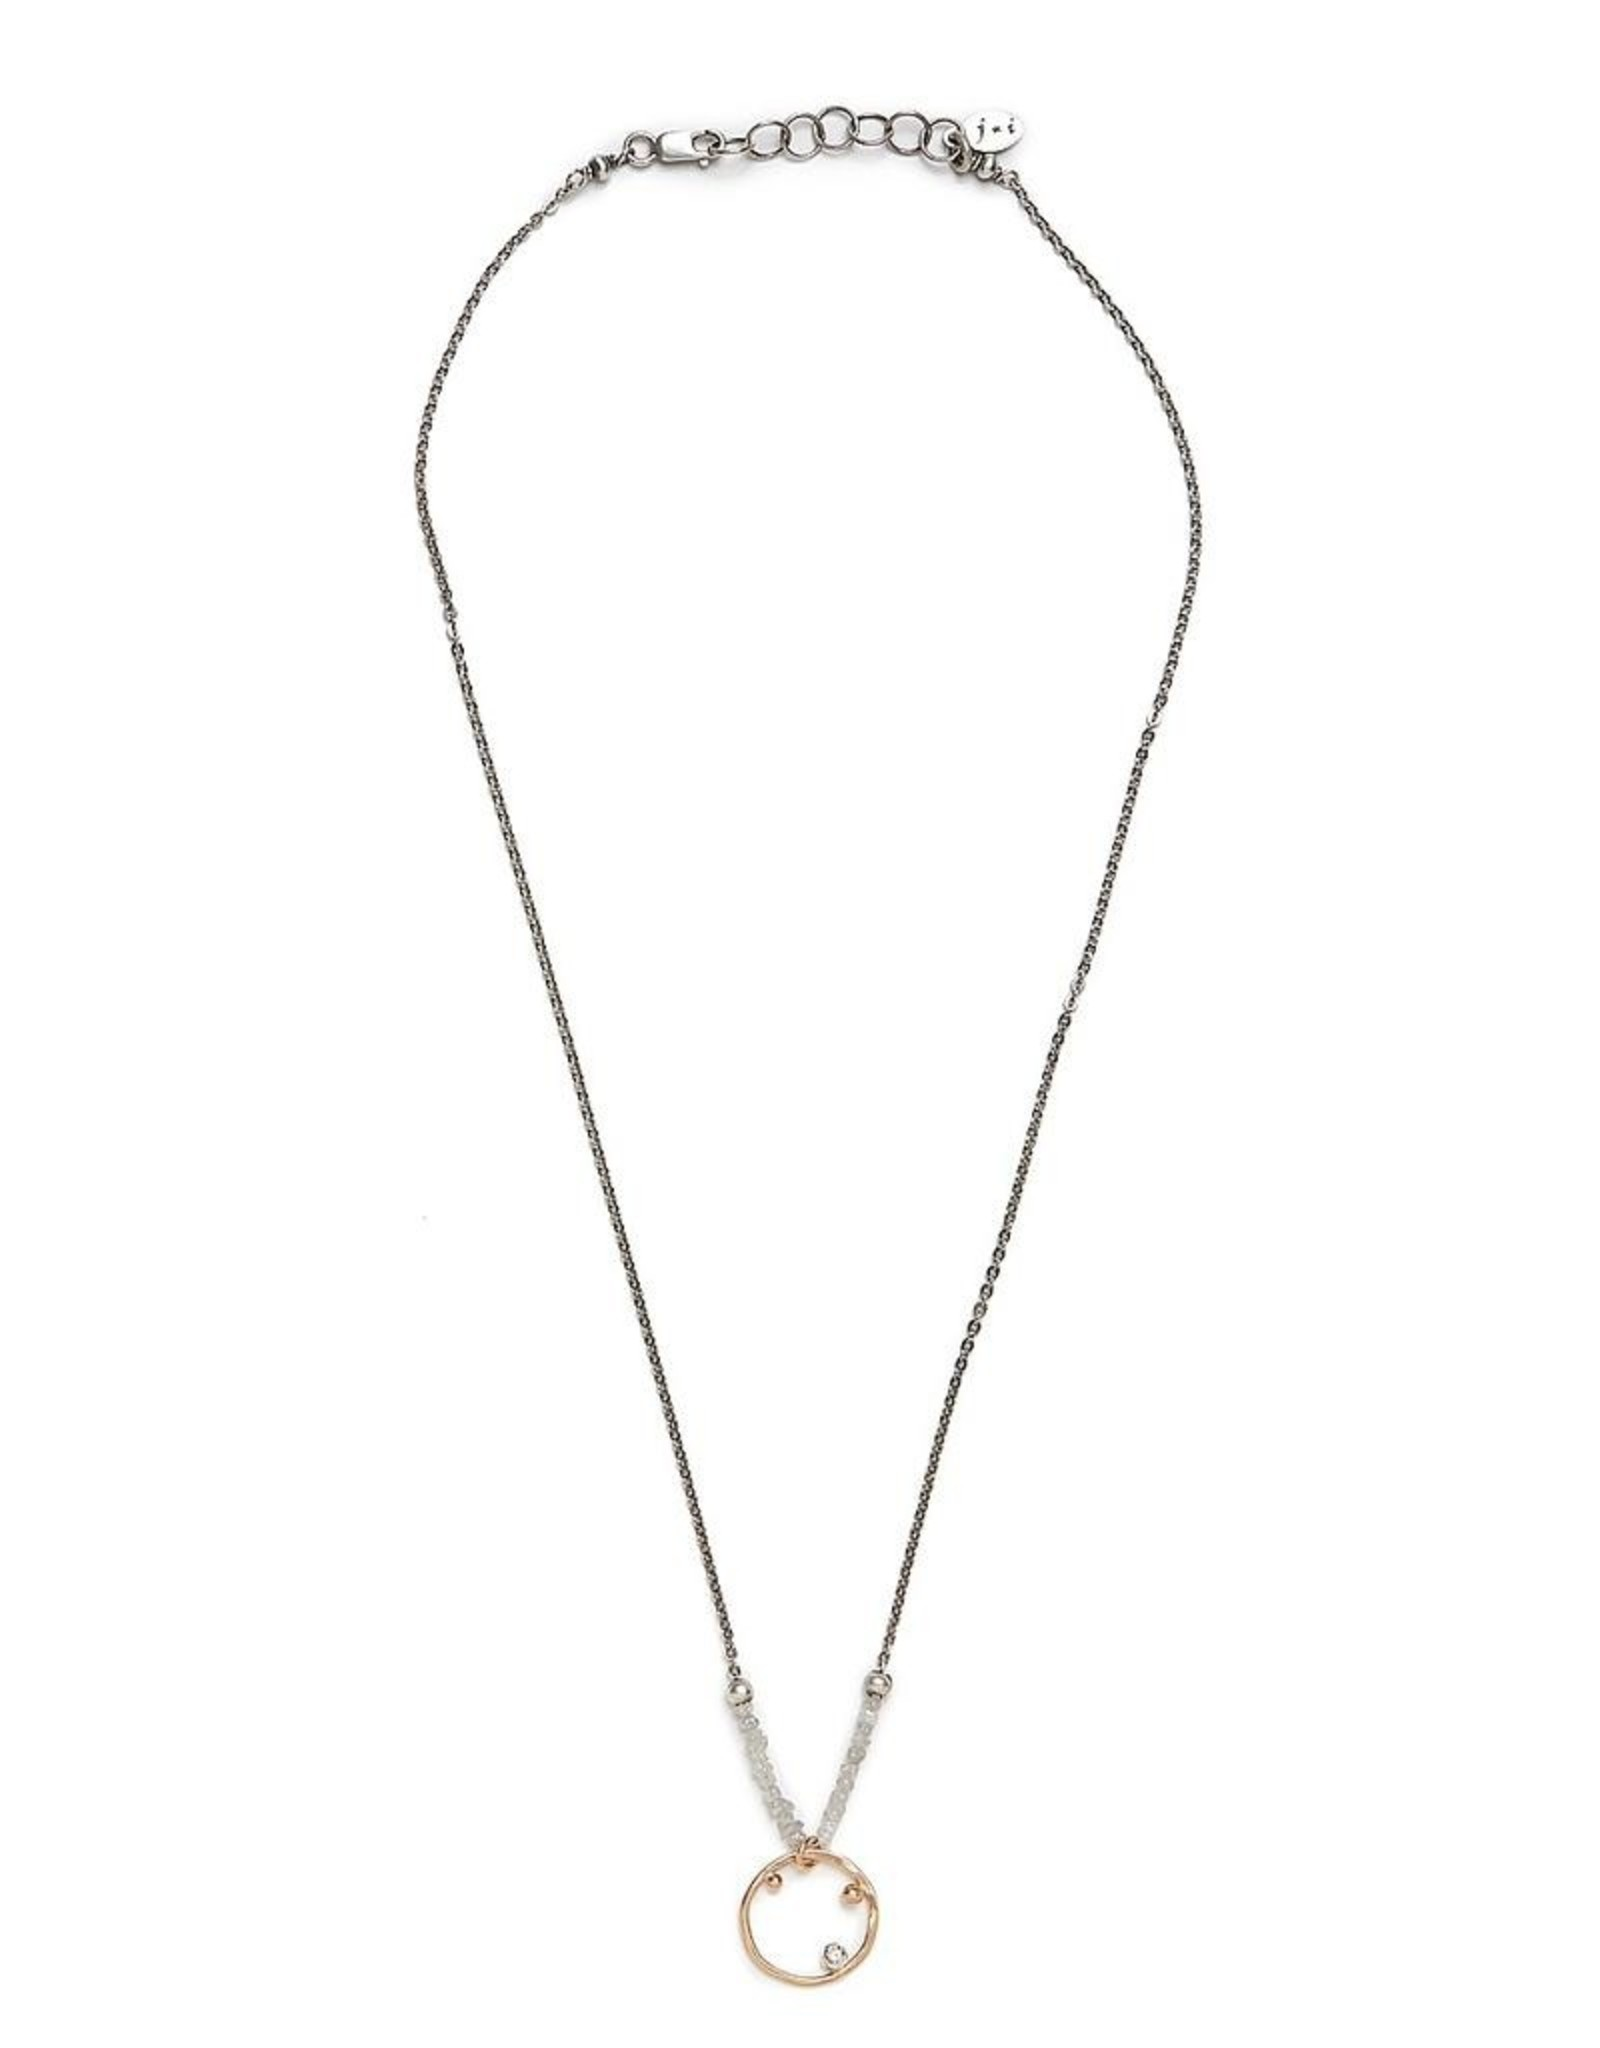 "J&I Handmade 14k Goldfill Pendant with 2.1mm Chocolate Diamond on White Diamond Chip Necklace, 18"""